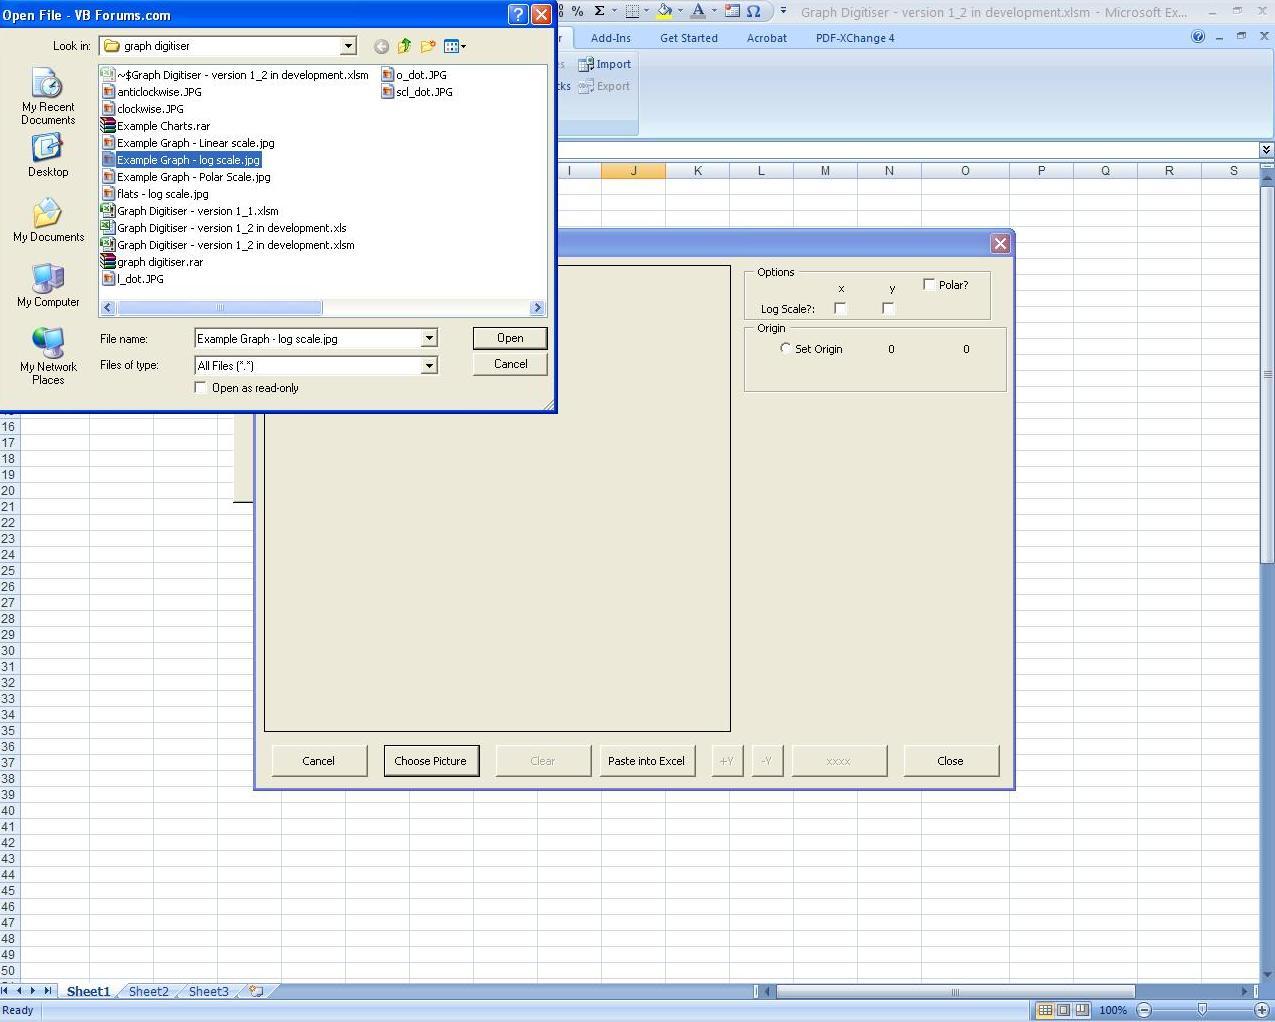 Excel Vba Sort Array Smallest To Largest